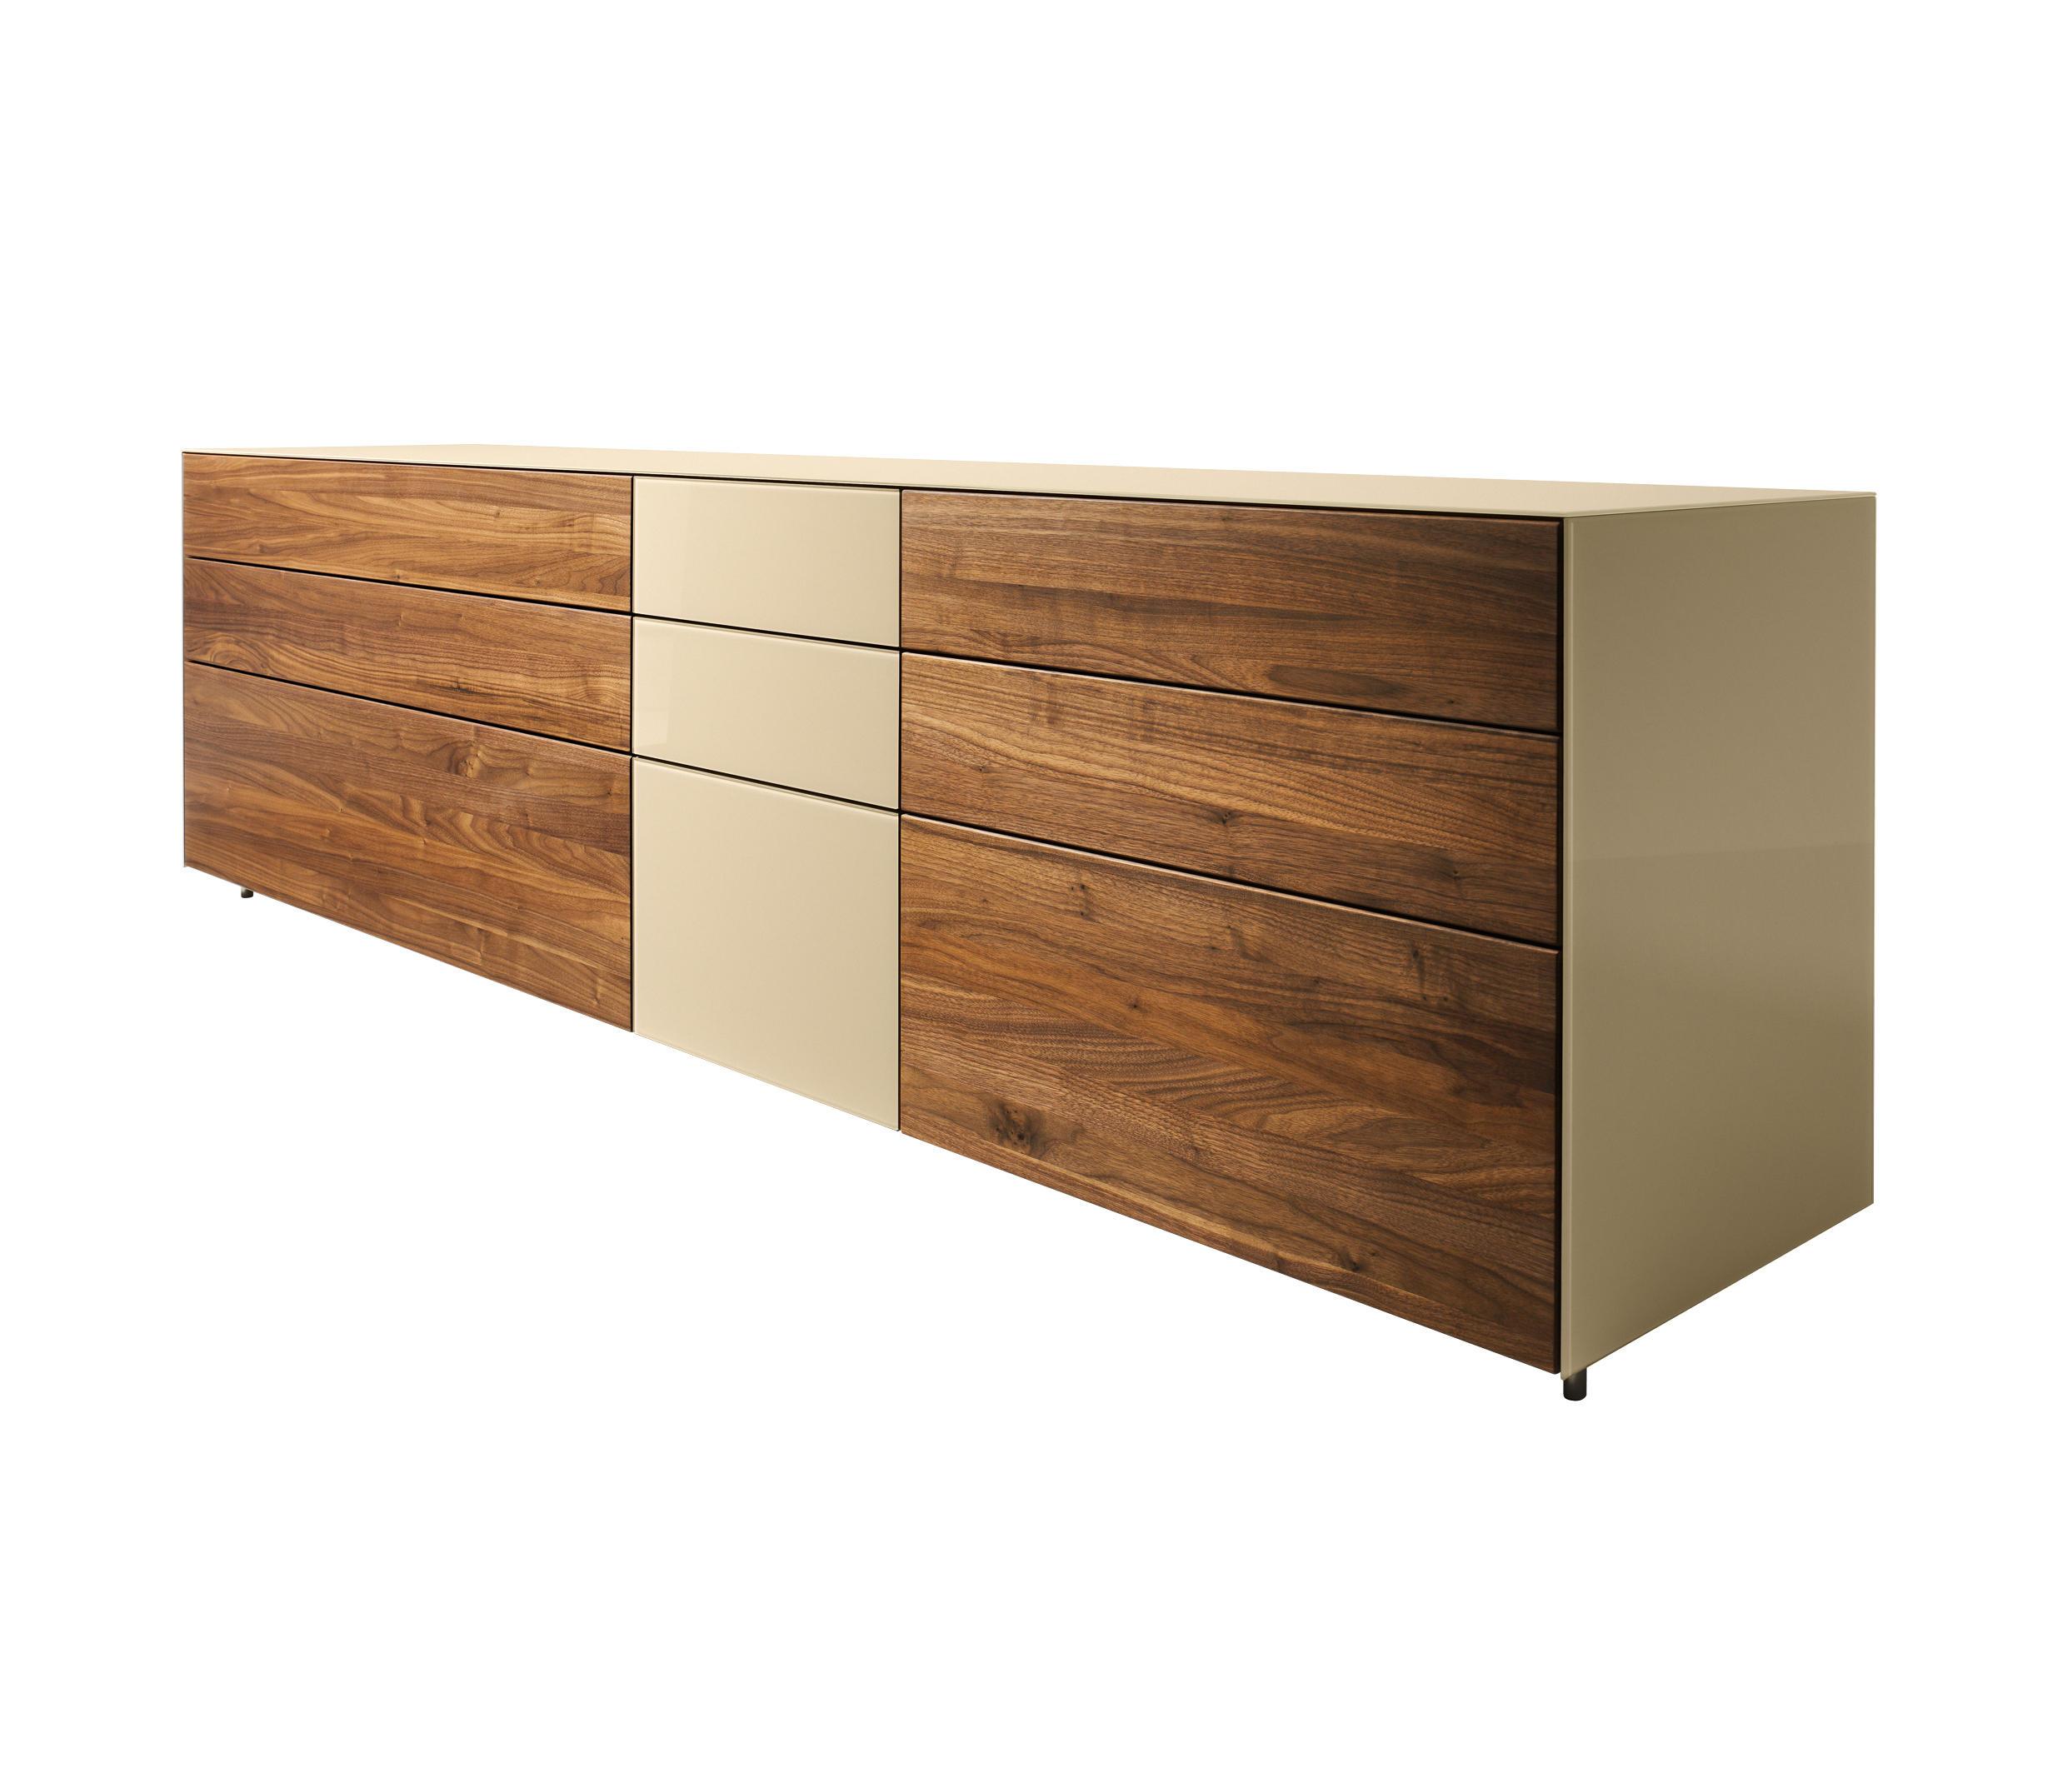 cubus pure anrichte sideboards kommoden von team 7. Black Bedroom Furniture Sets. Home Design Ideas